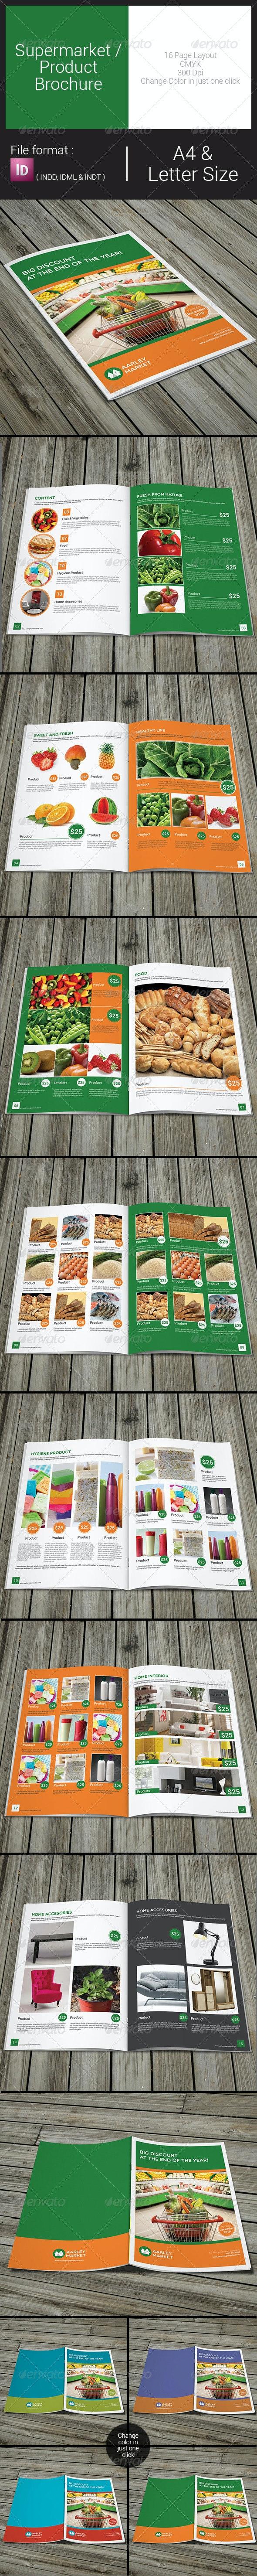 Supermarket / Product Brochure - Catalogs Brochures